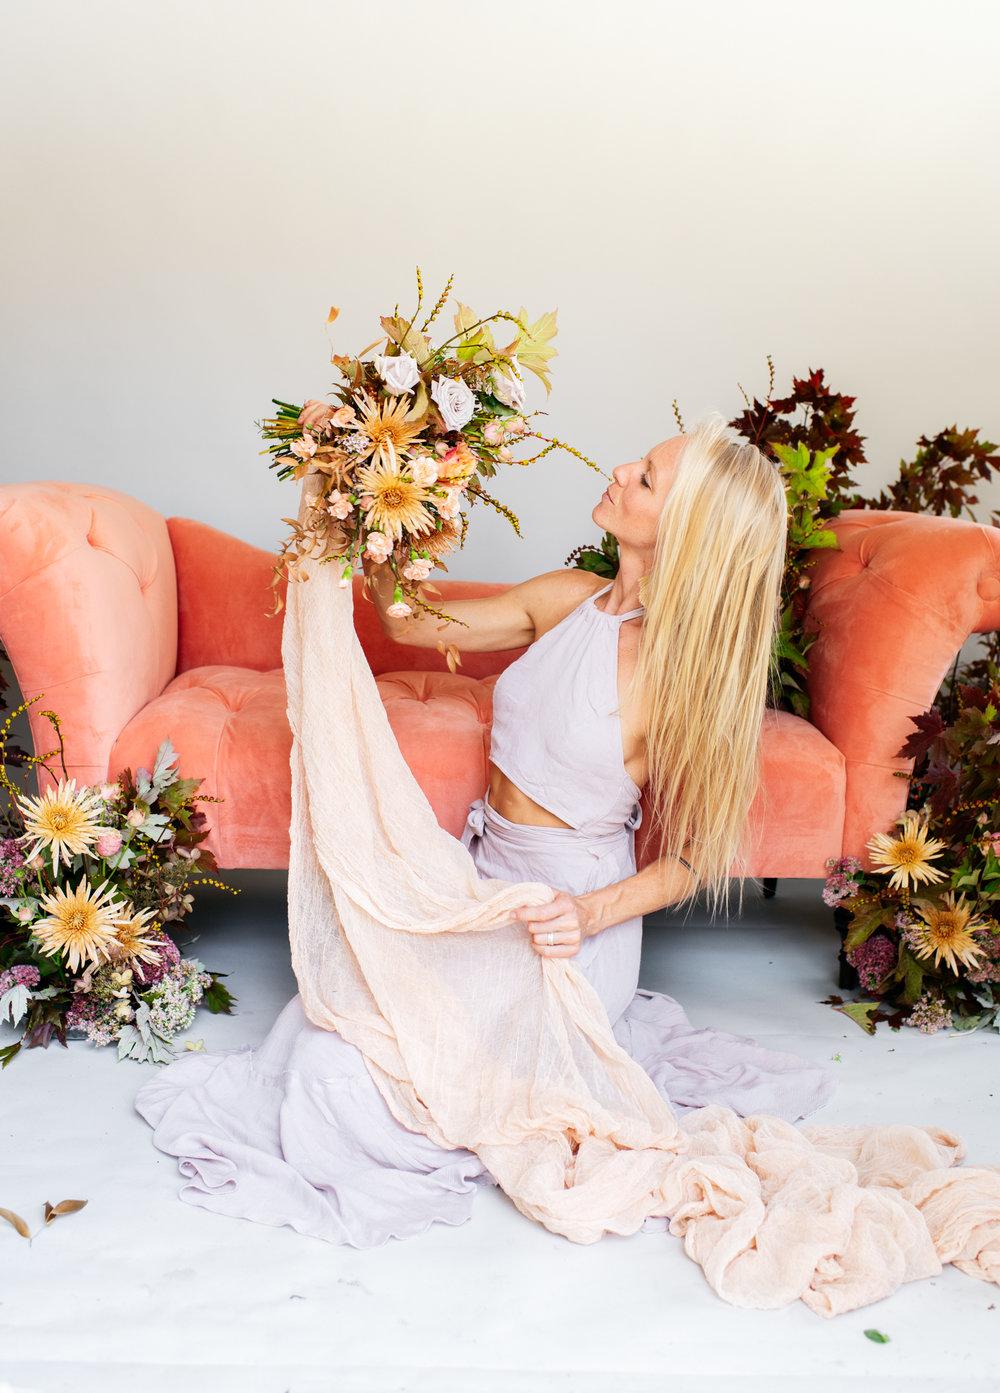 NECTAR + BLOOM Floral Design || SamErica Studios 7.jpg